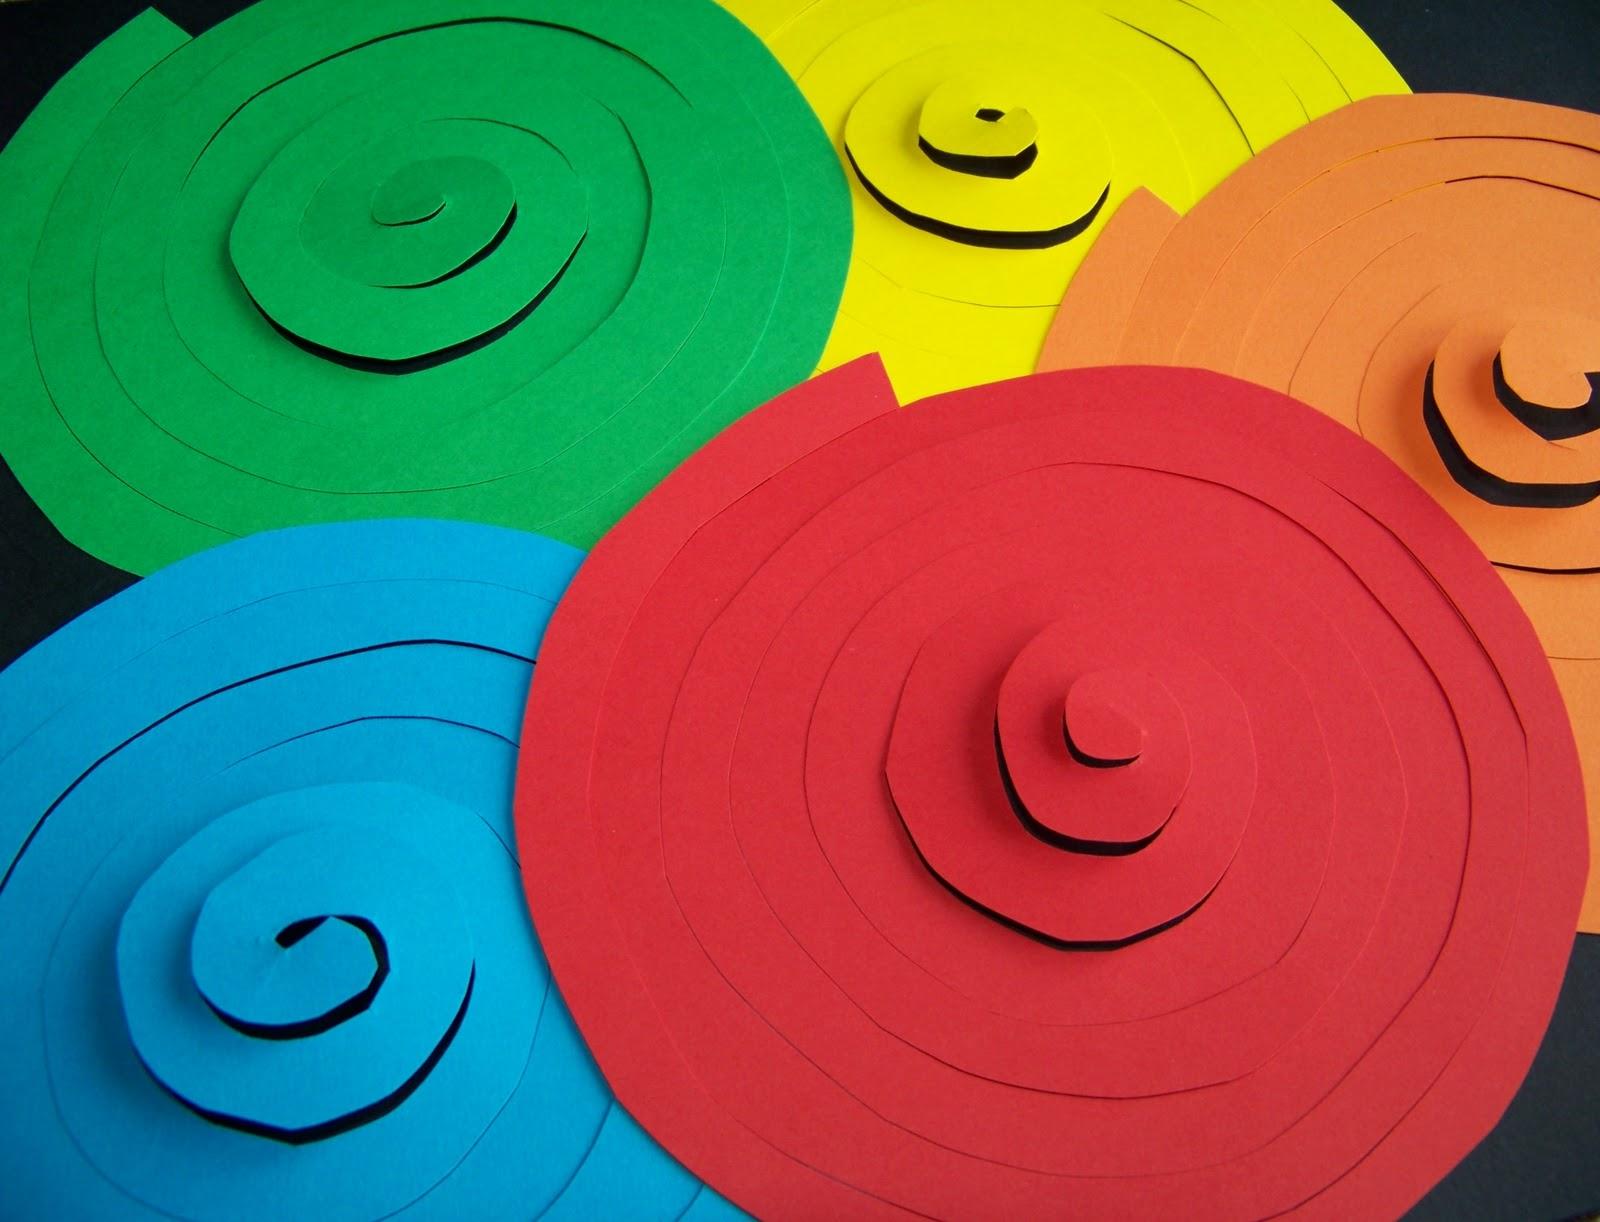 Mamma giochiamo addobbi di carnevale spirali e for Addobbi per l aula di carnevale